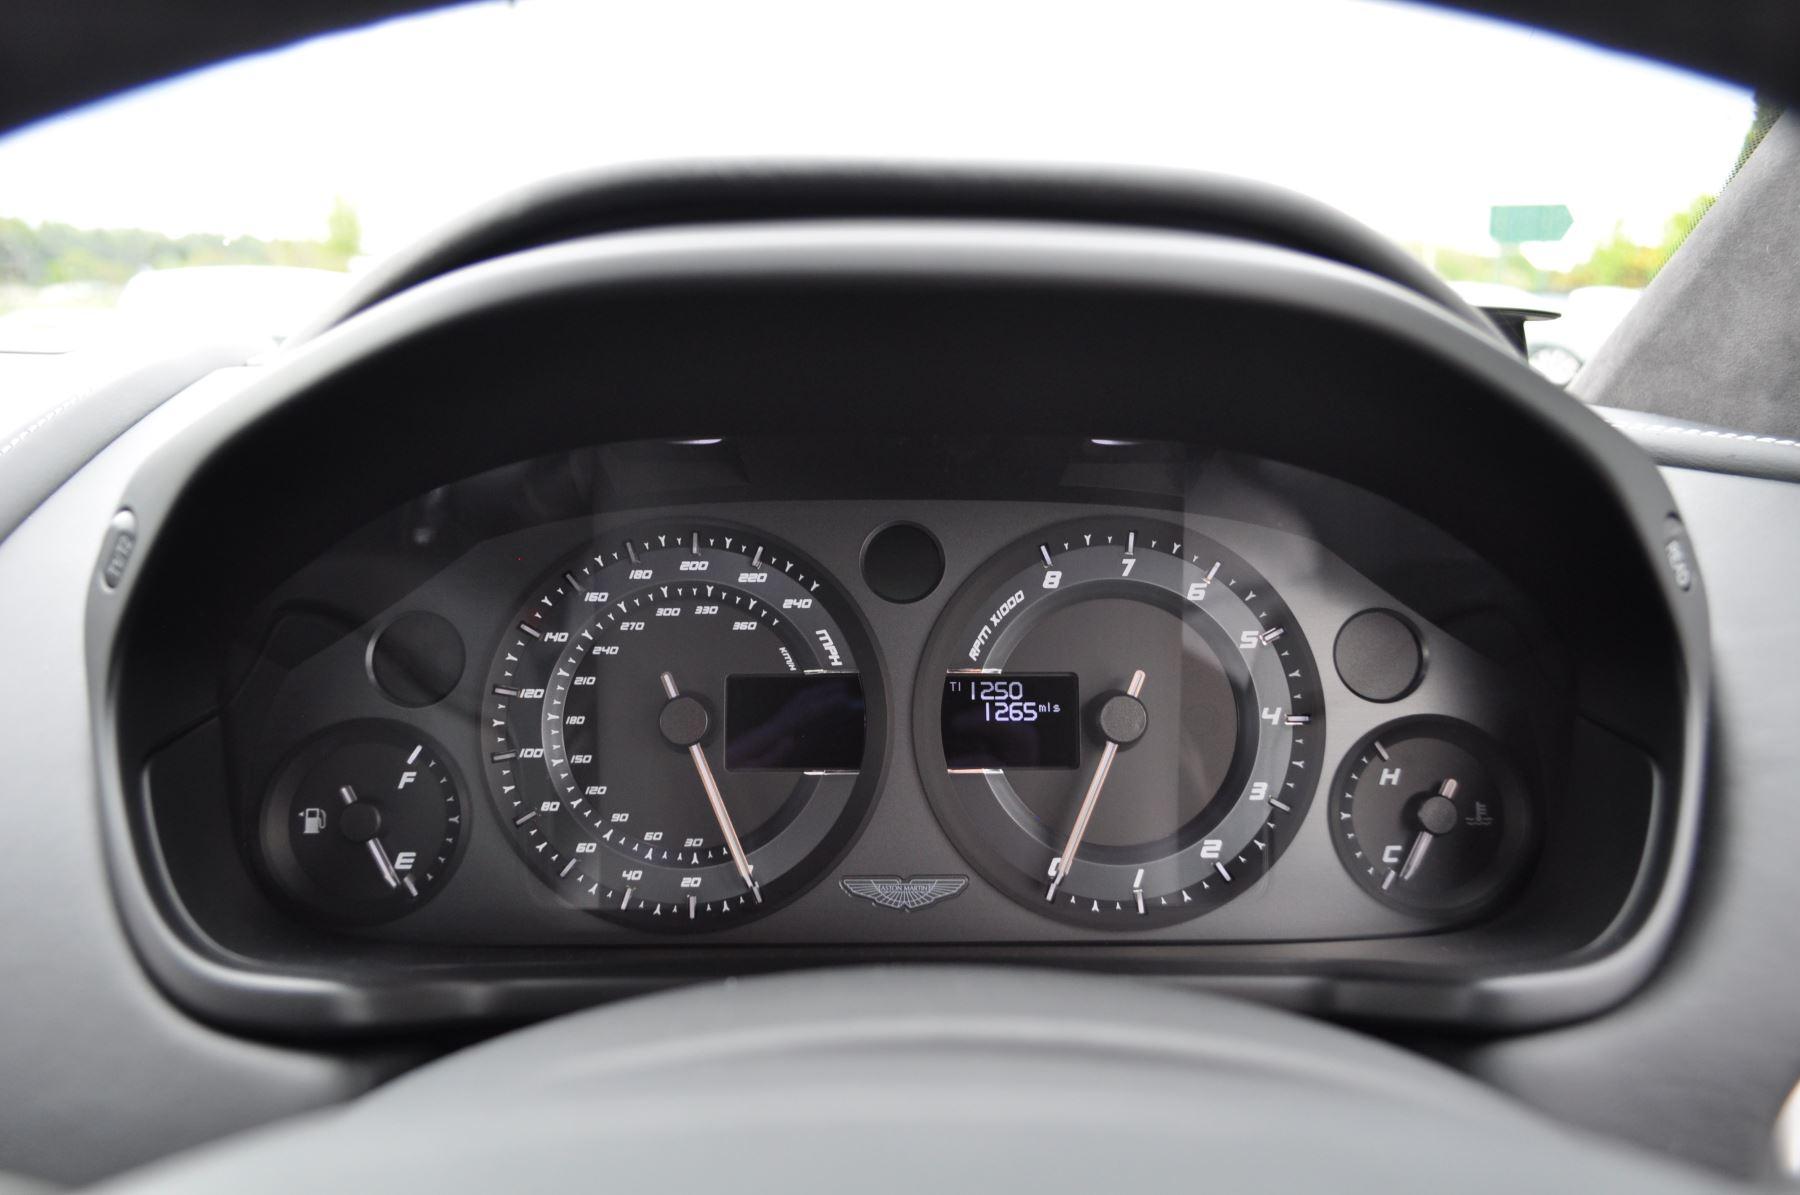 Aston Martin Vanquish V12 [595] S 2+2 2dr Touchtronic image 30